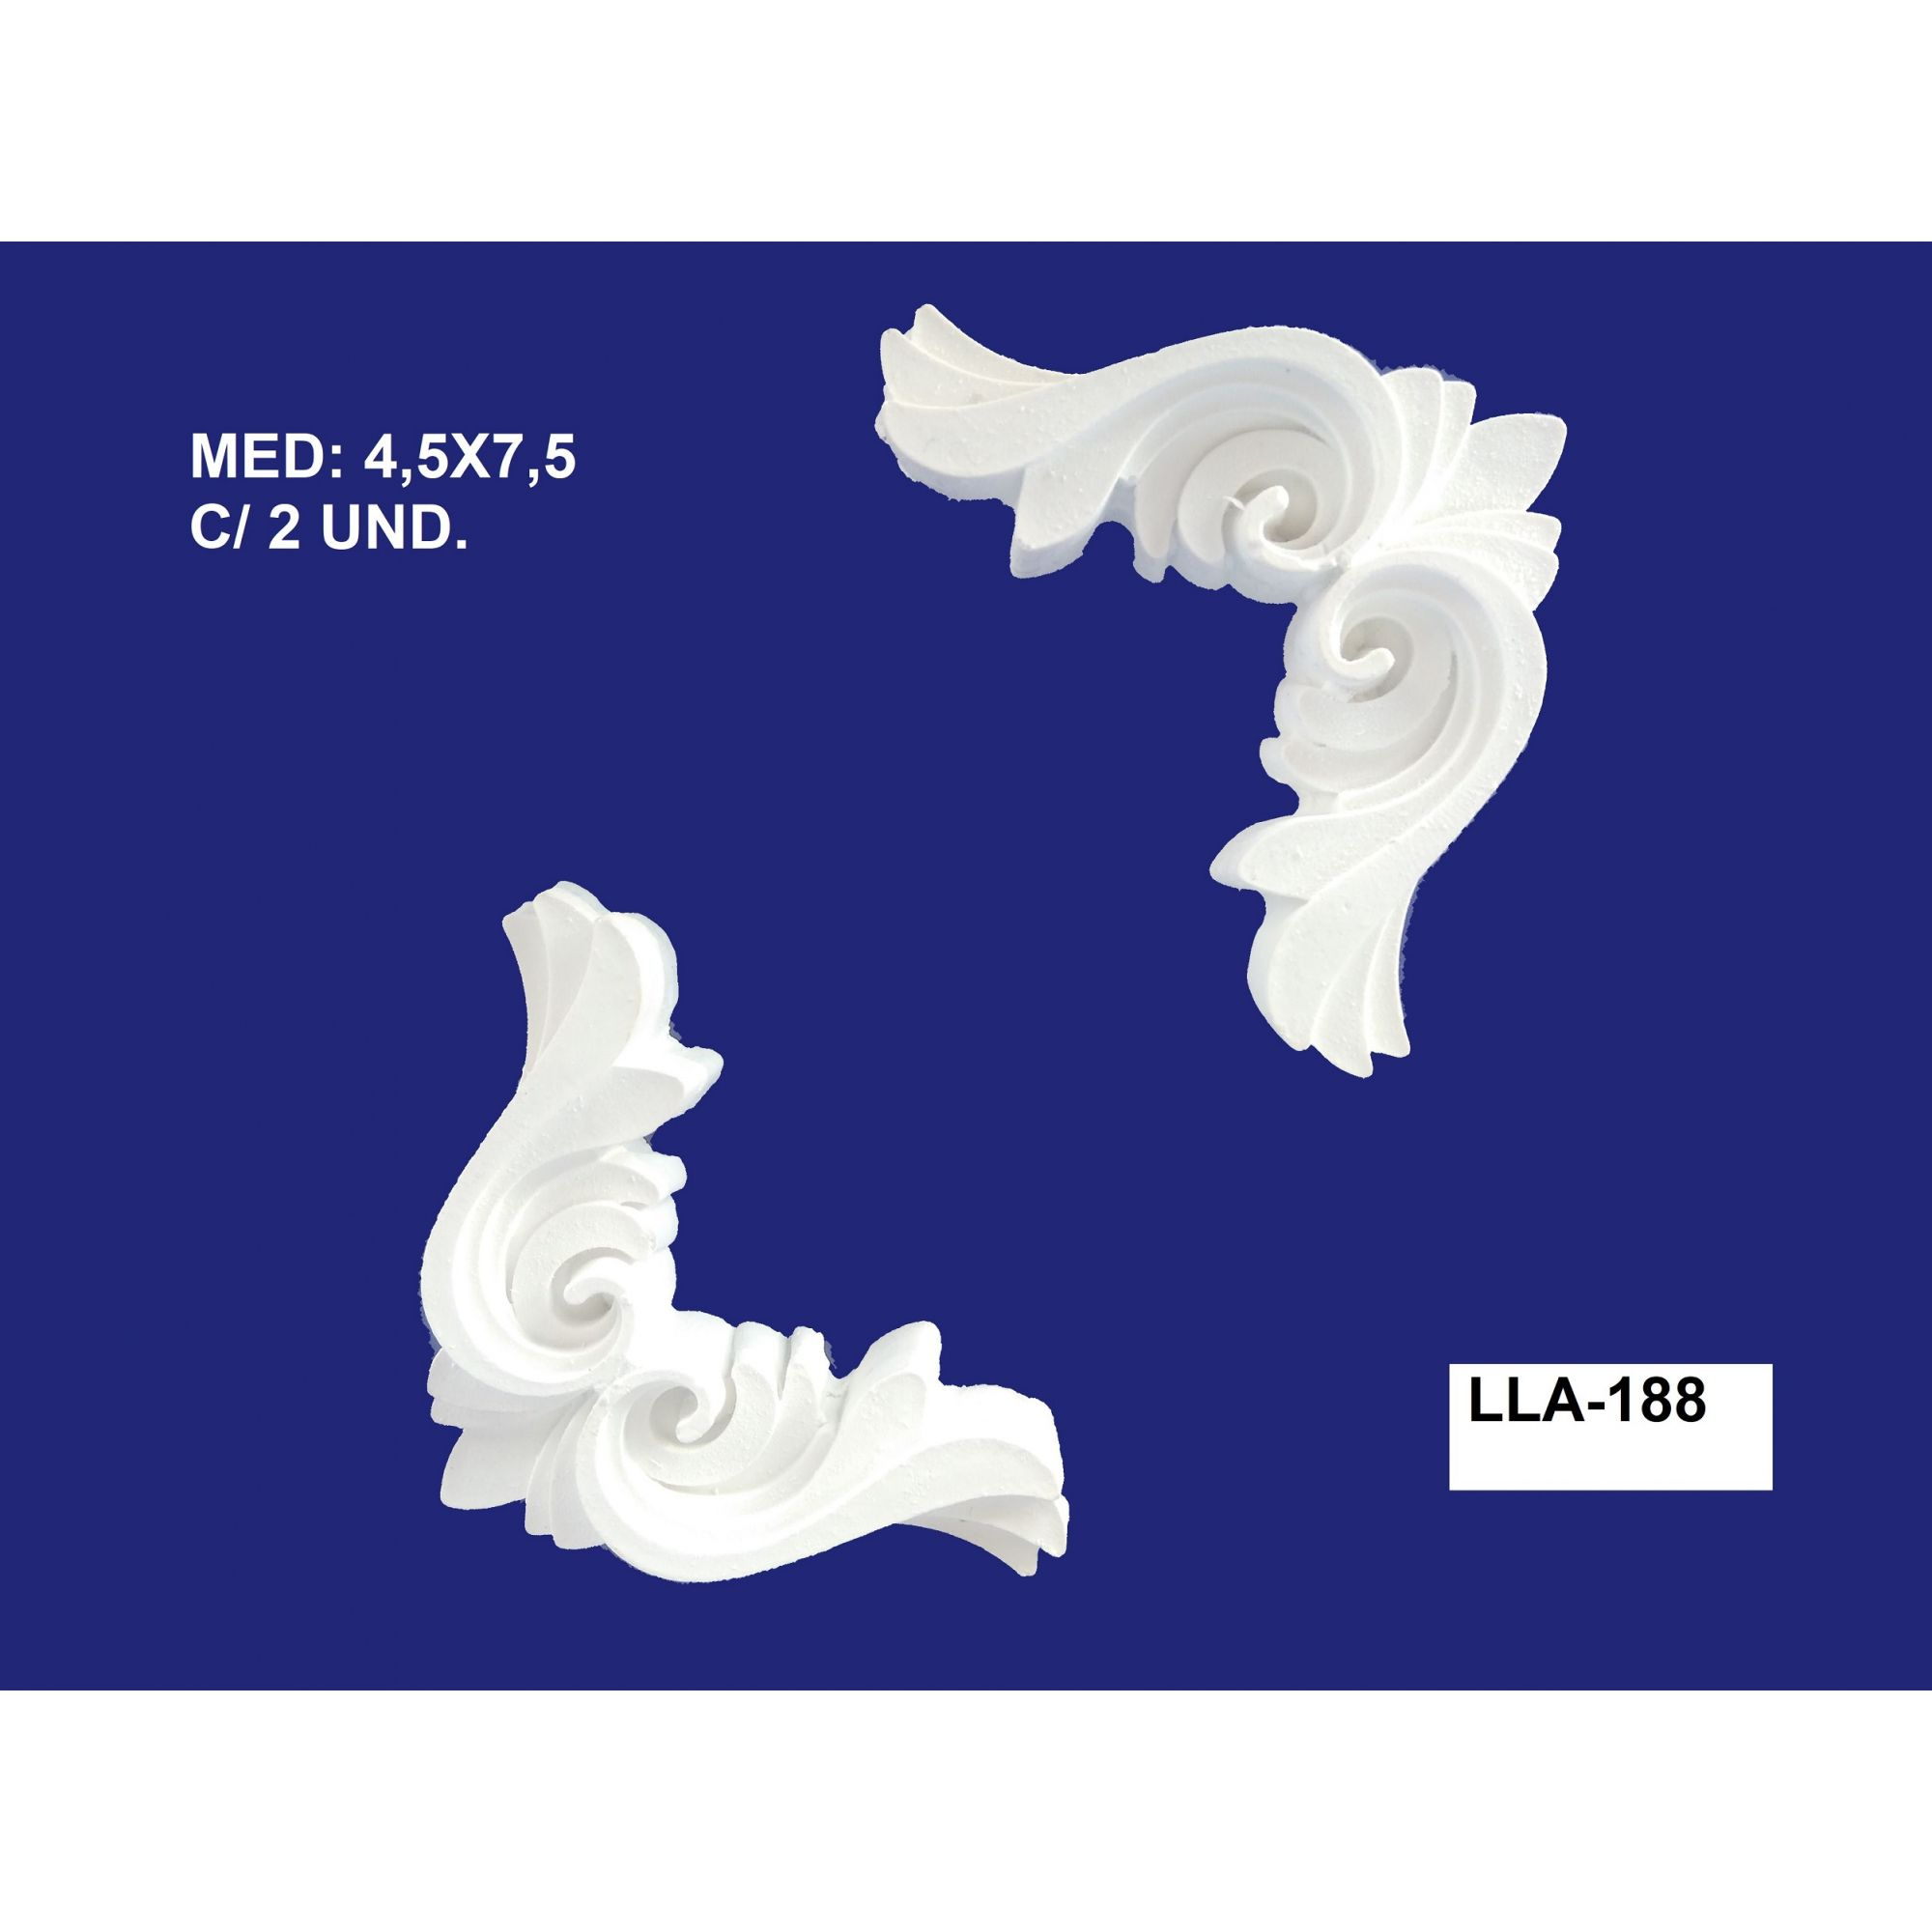 LLA-188 CANTONEIRA 4,5X7,5CM C/ 2 UND.